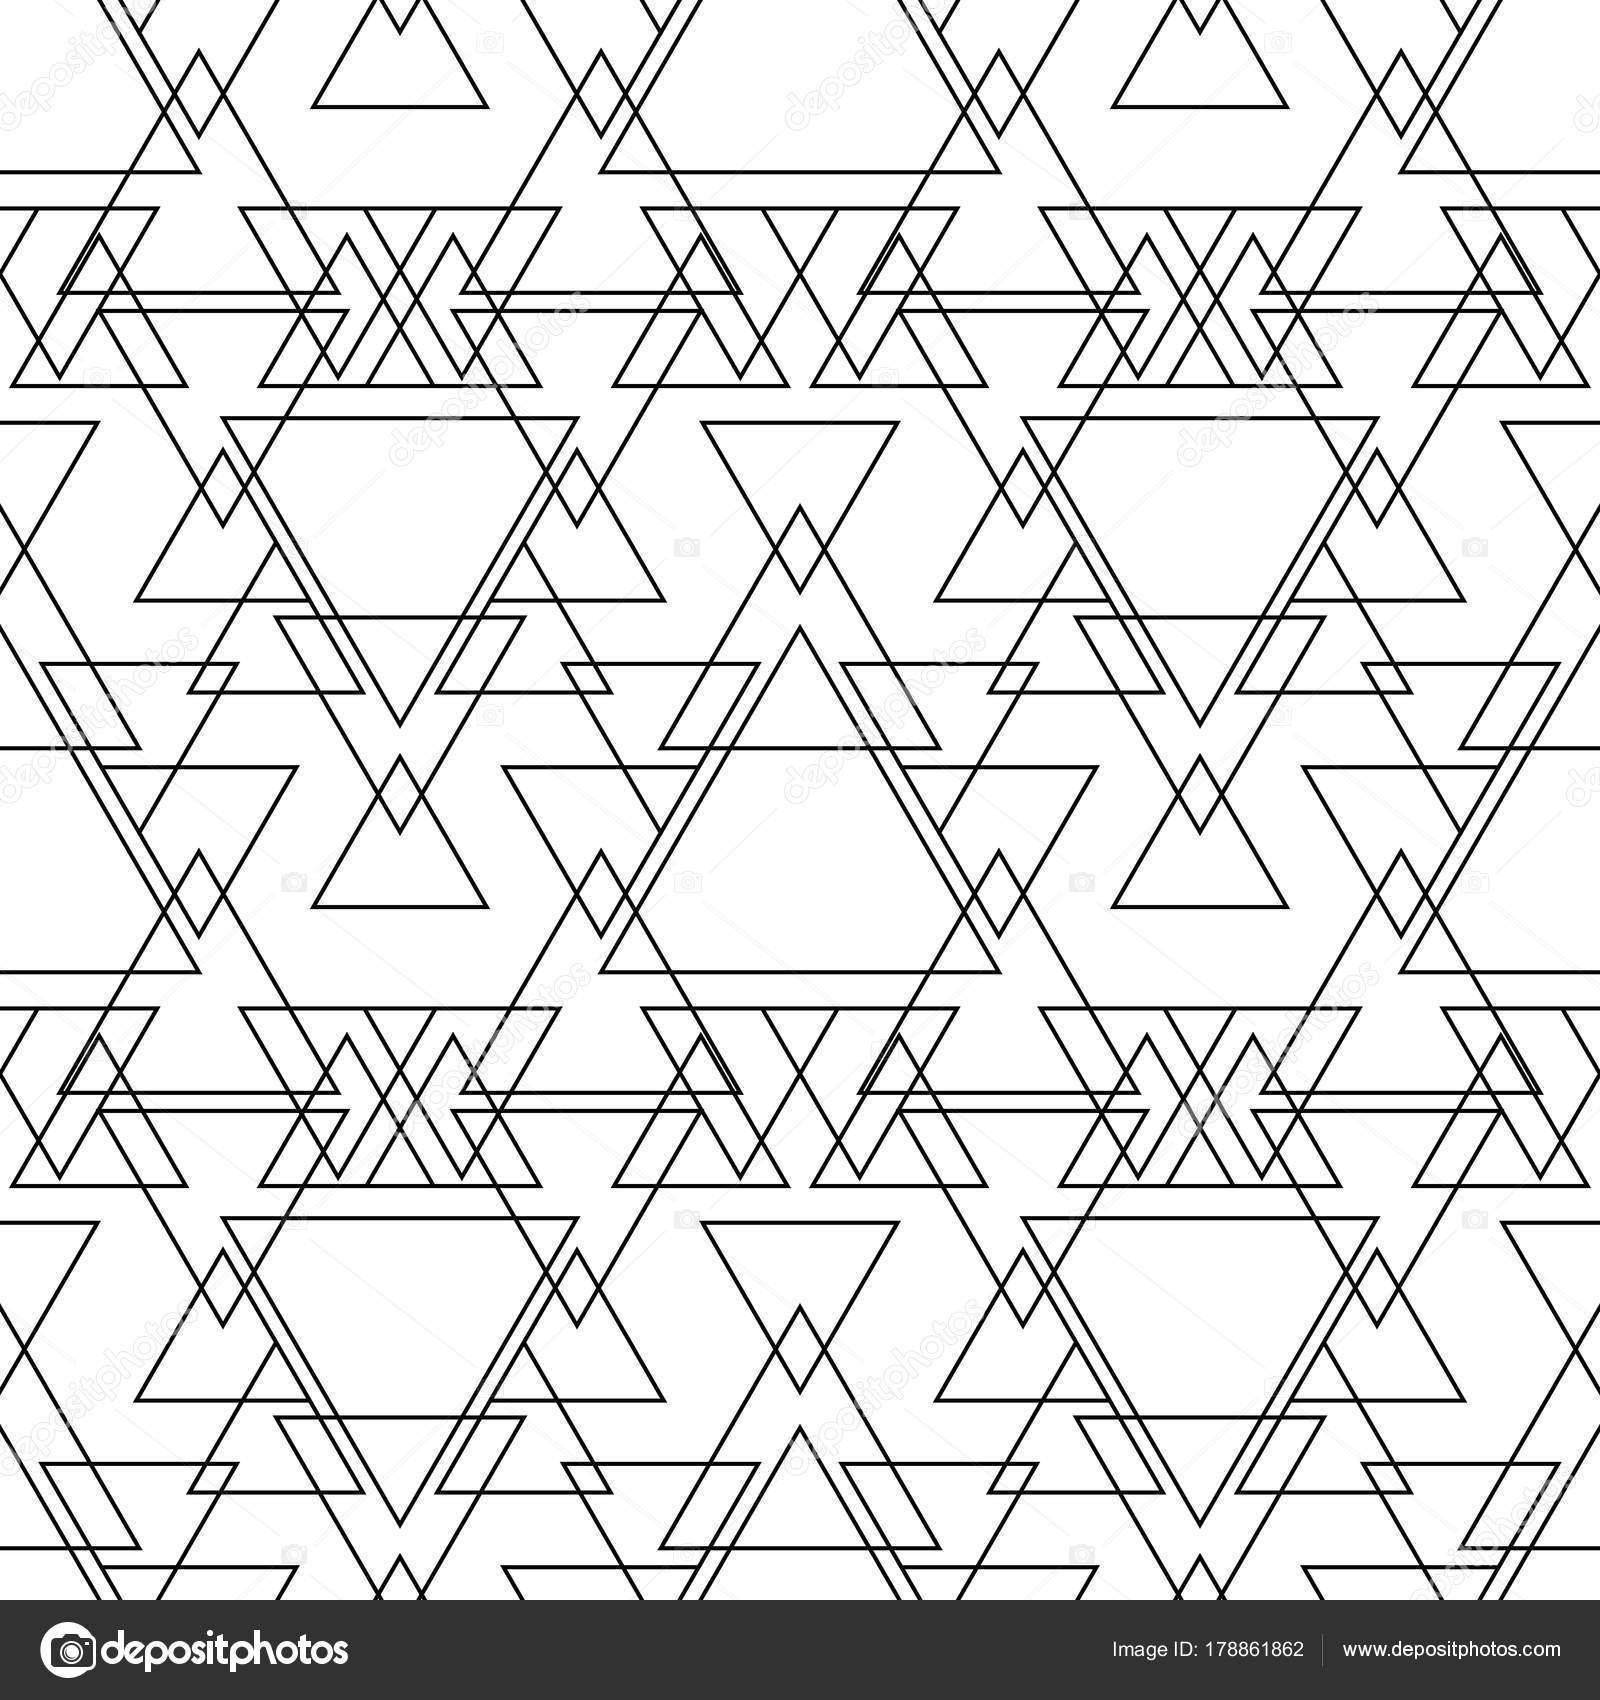 Black White Minimal Wallpaper Seamless Black And White Minimal